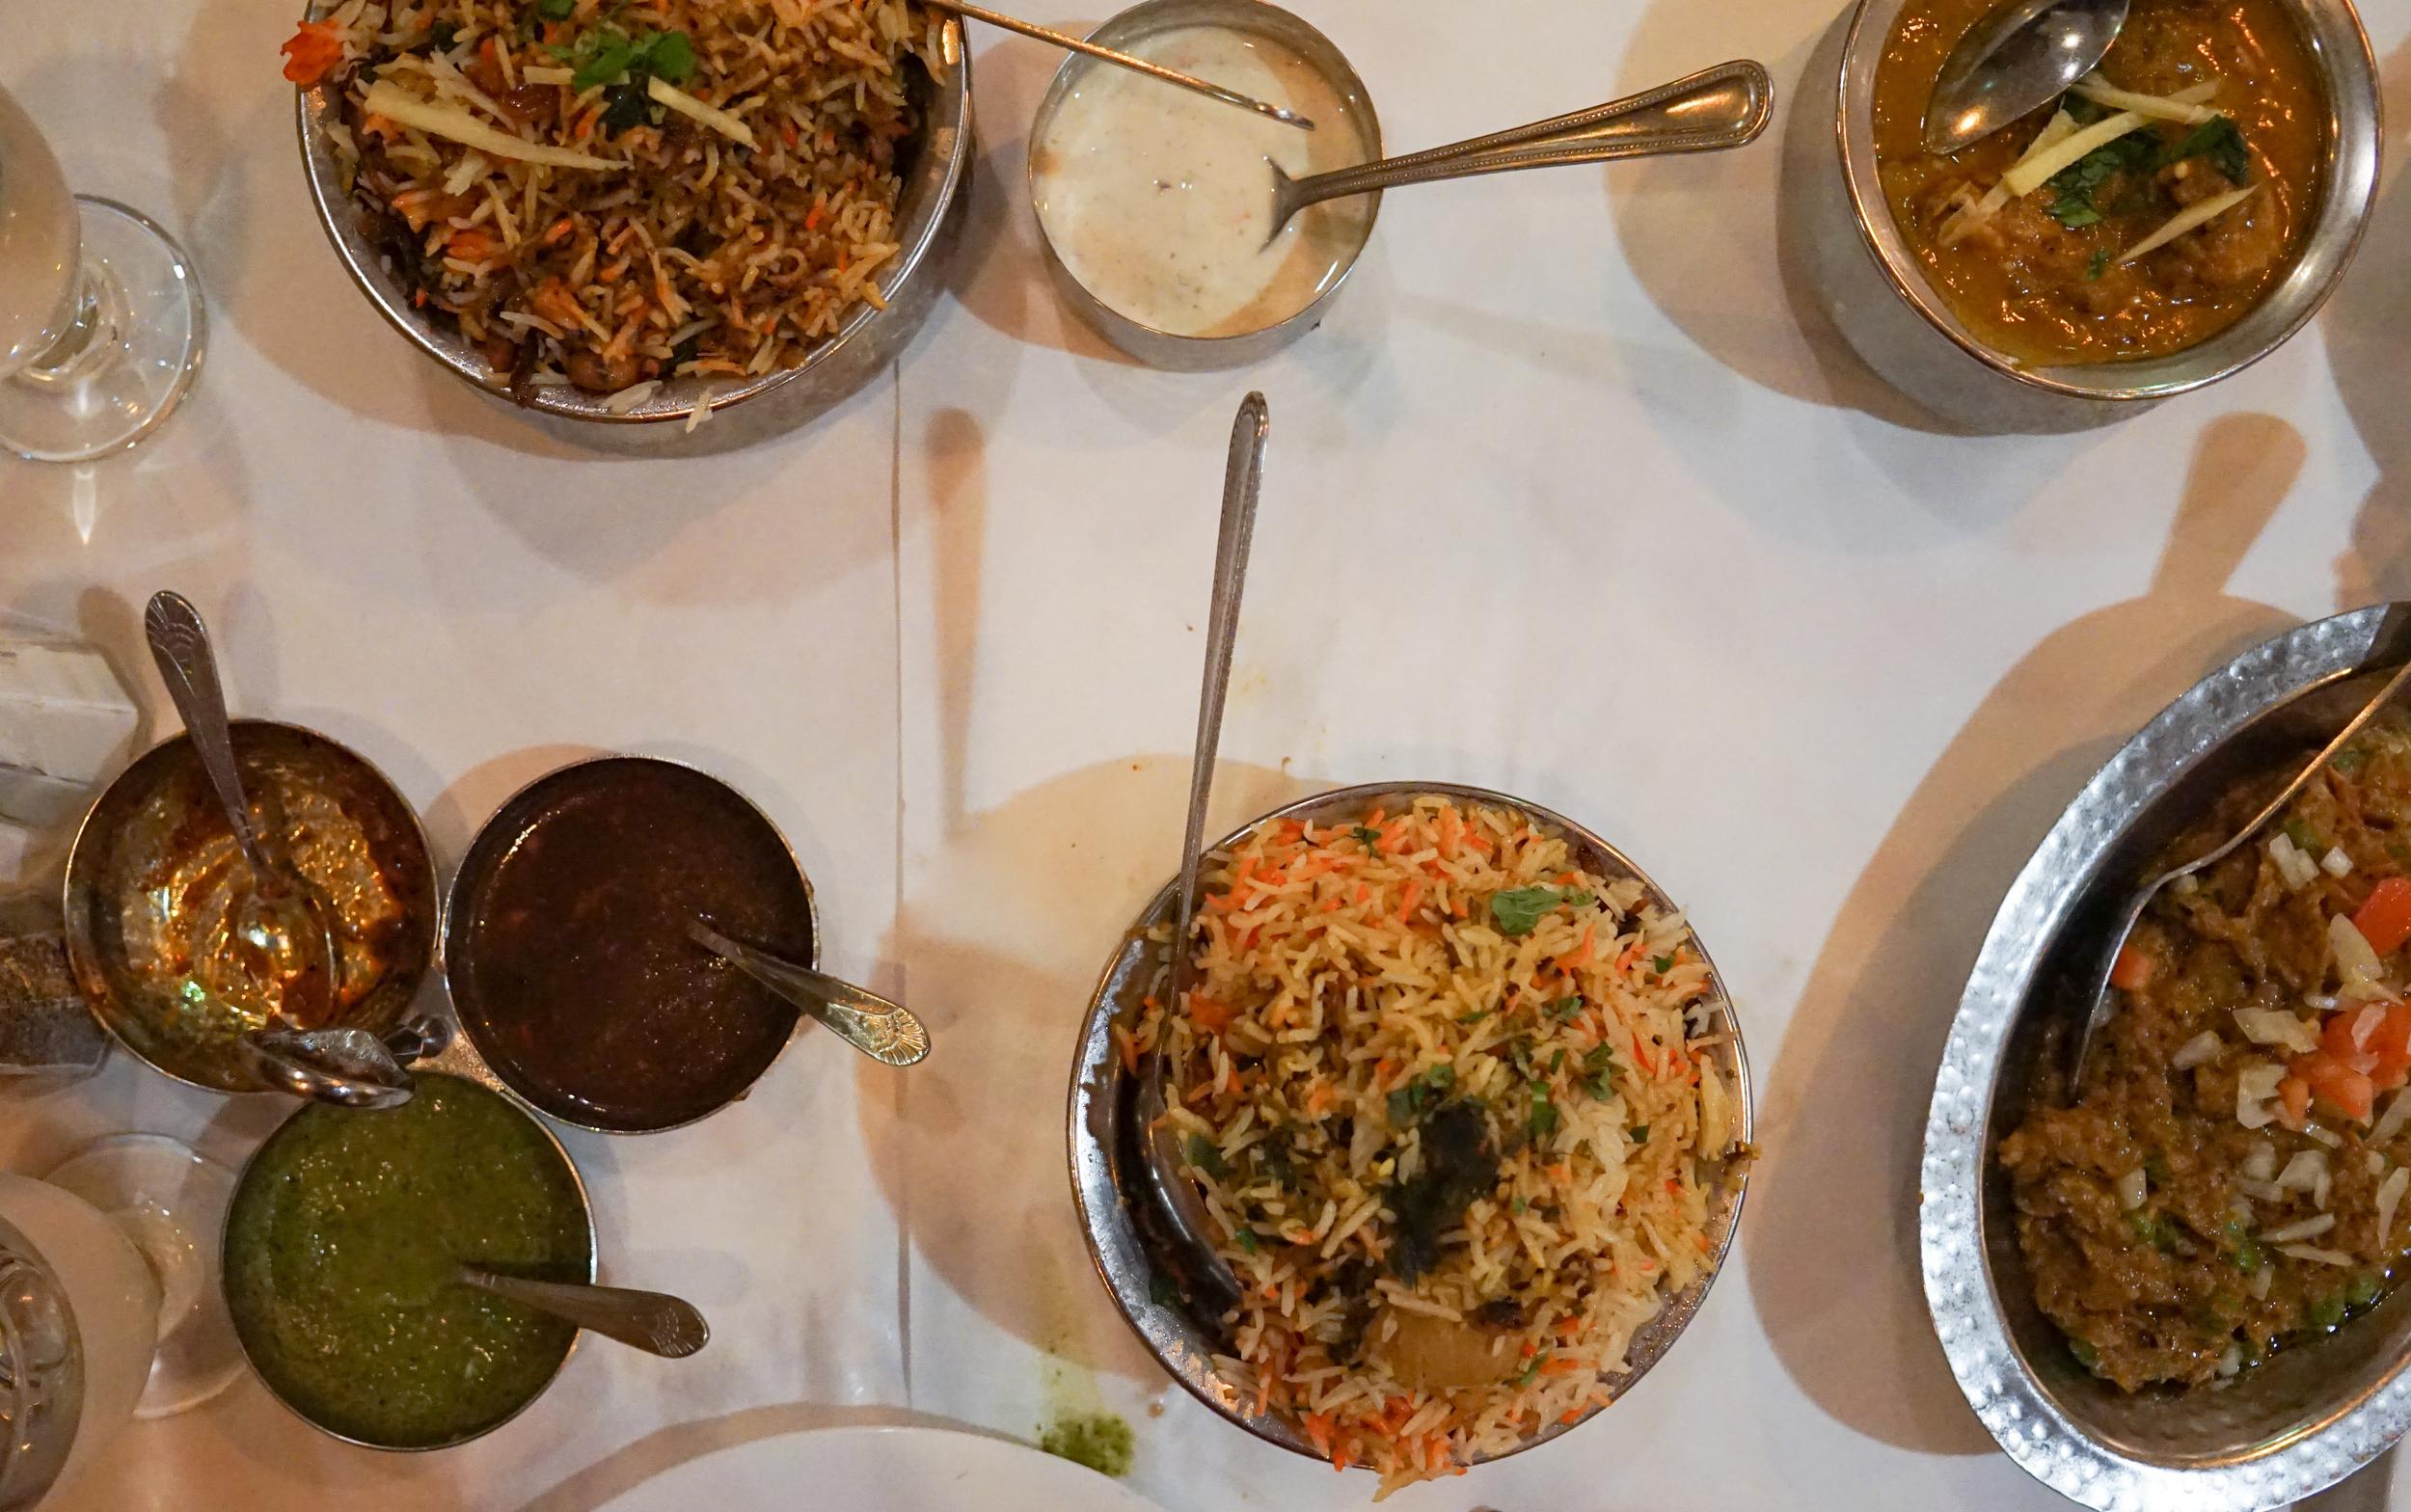 Chicken Biryani, Lamb Biryani, Baigan Ka Bharta